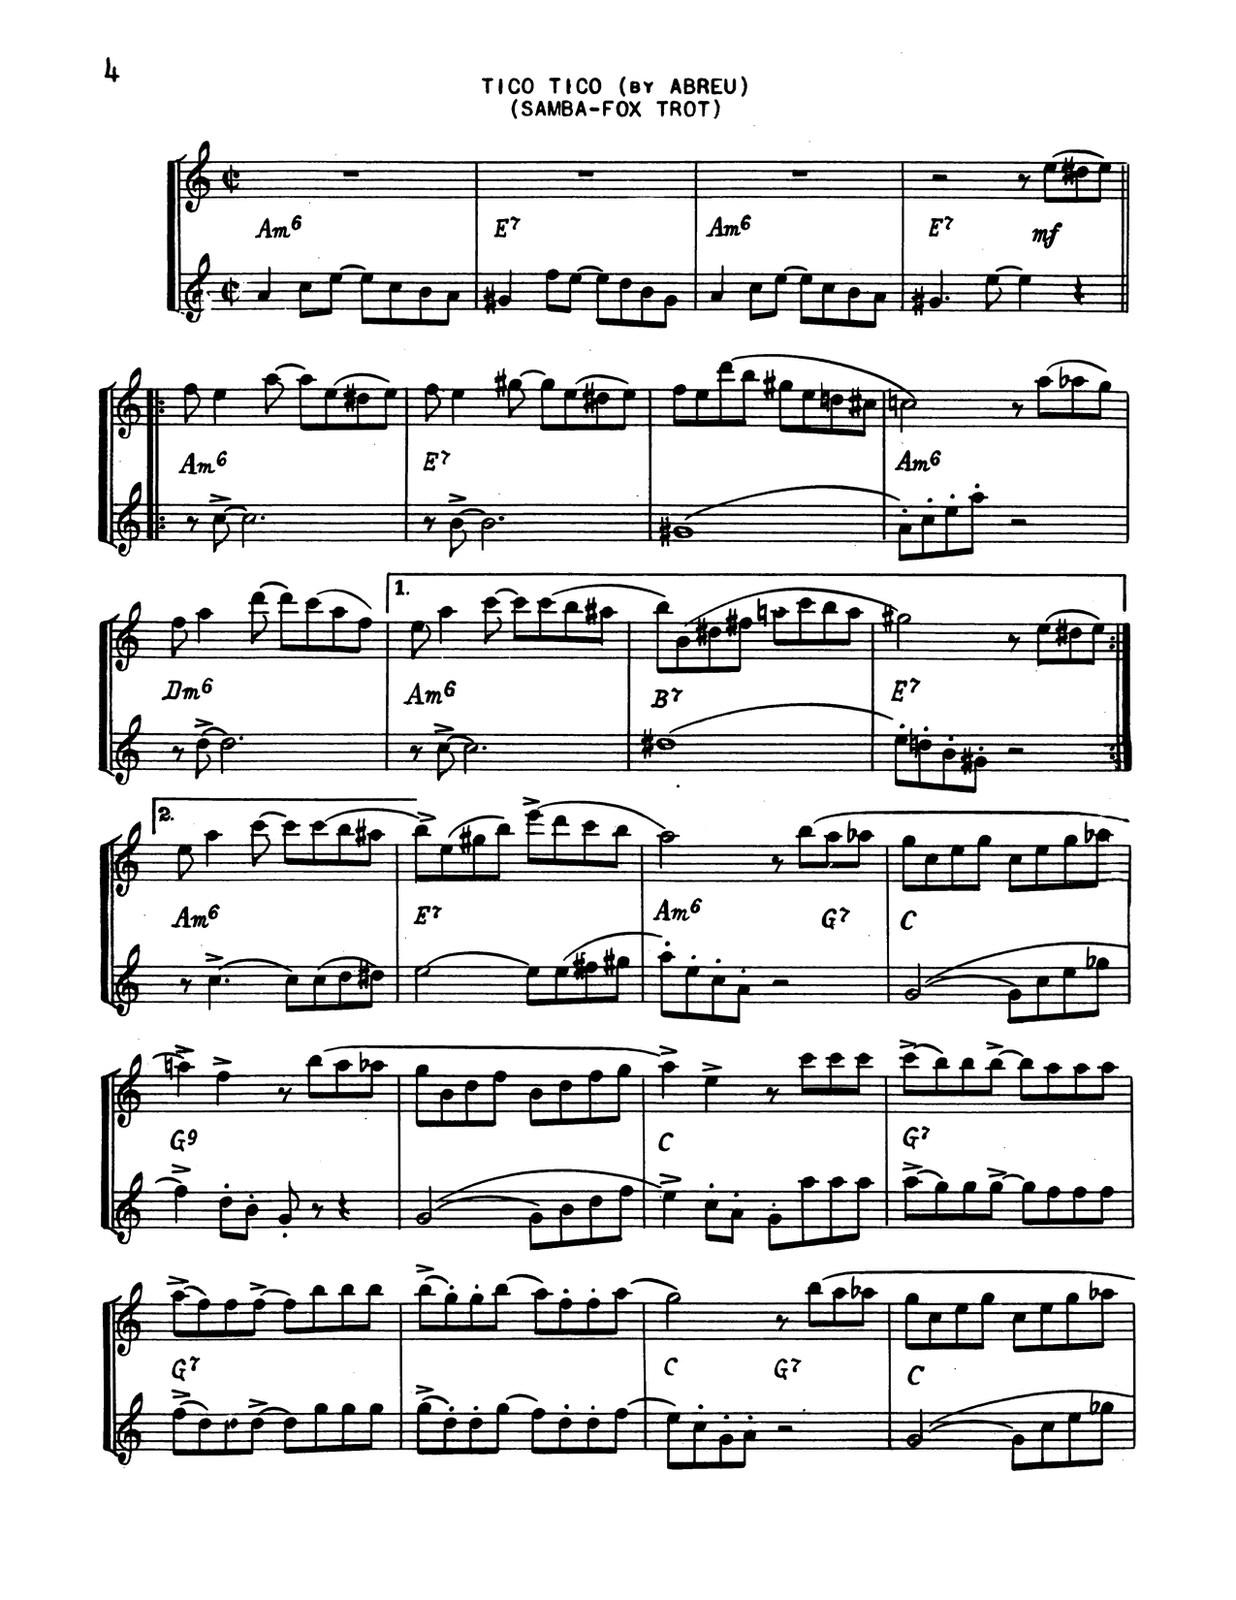 33 Latin Standards Combo Orks By Huffnagle Harry Paisner Ben